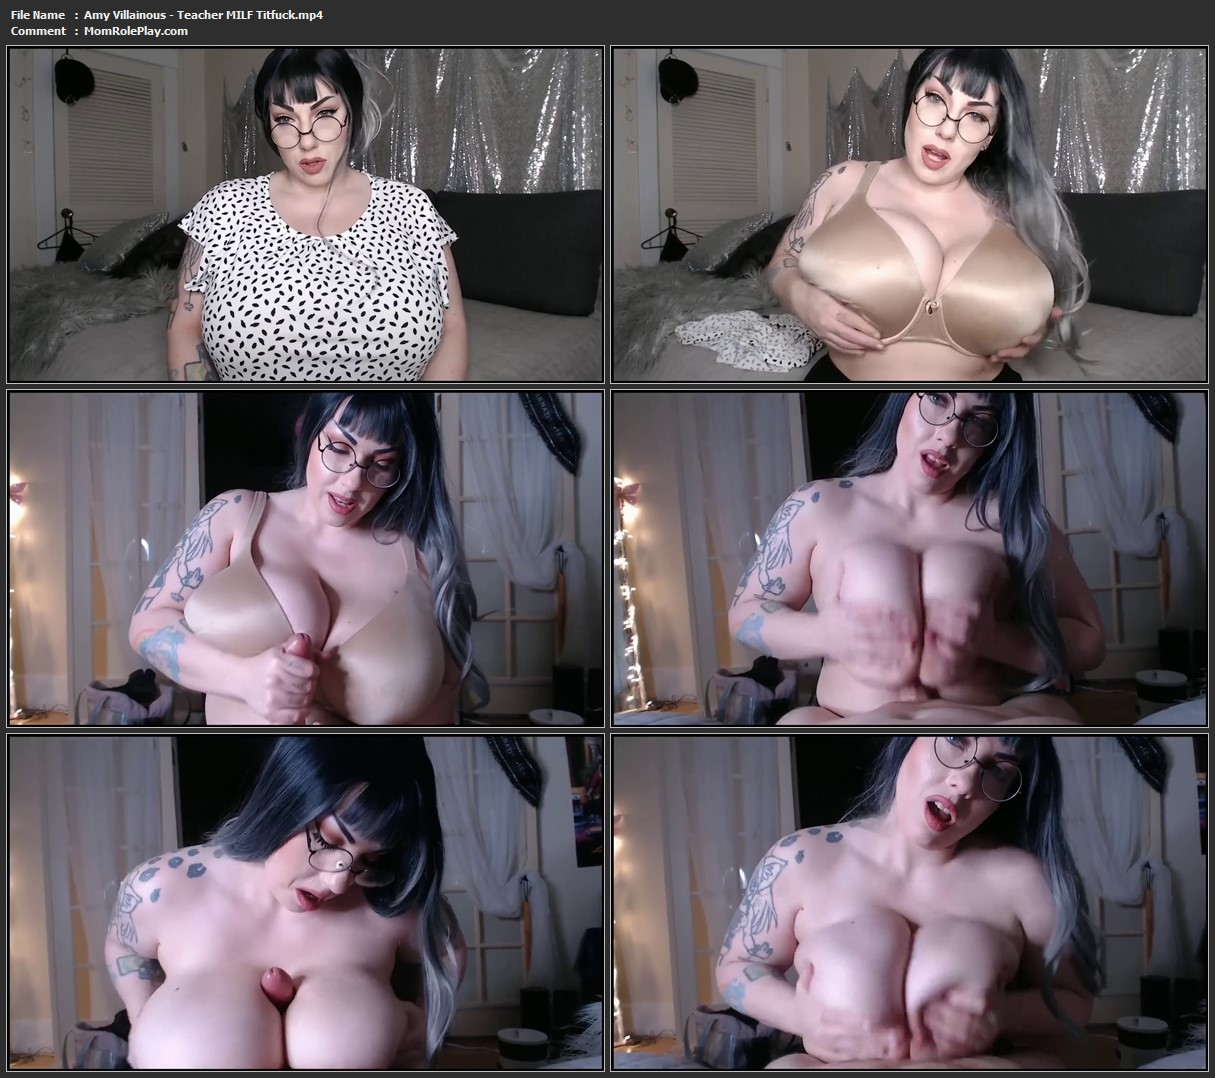 Amy Villainous - Teacher MILF Titfuck